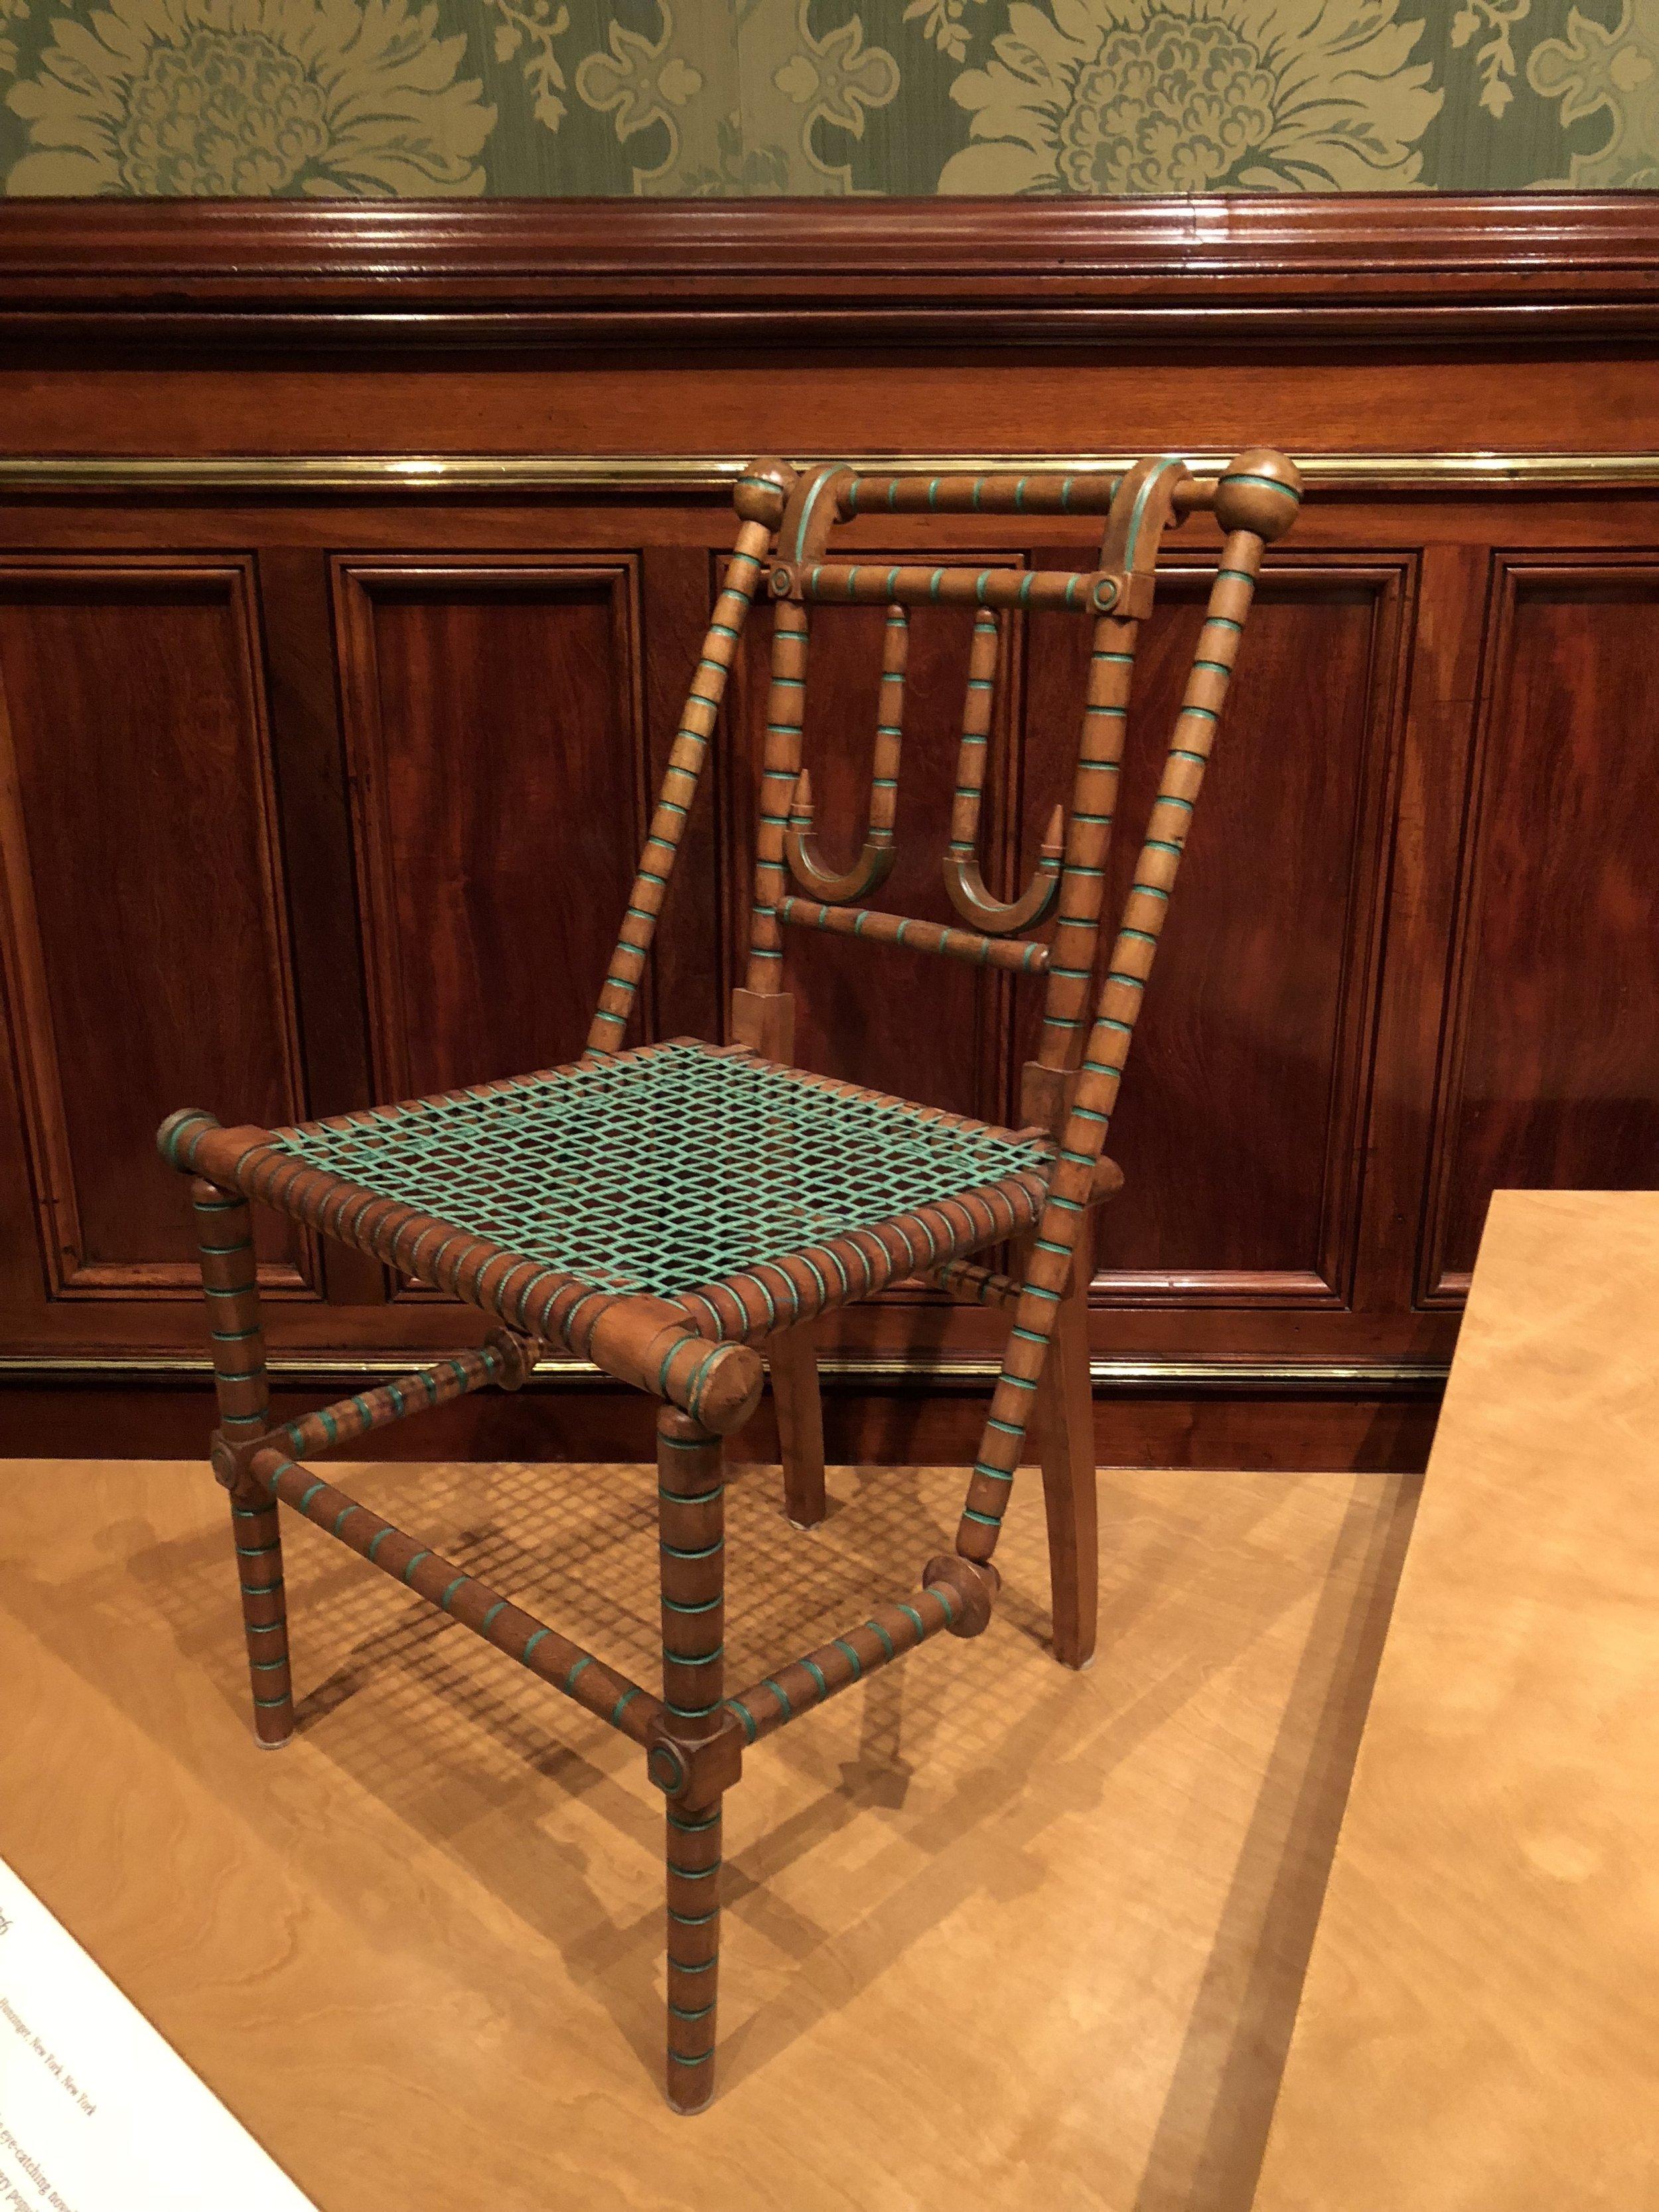 RWiunpatterned-driehaus-chair-5.jpg